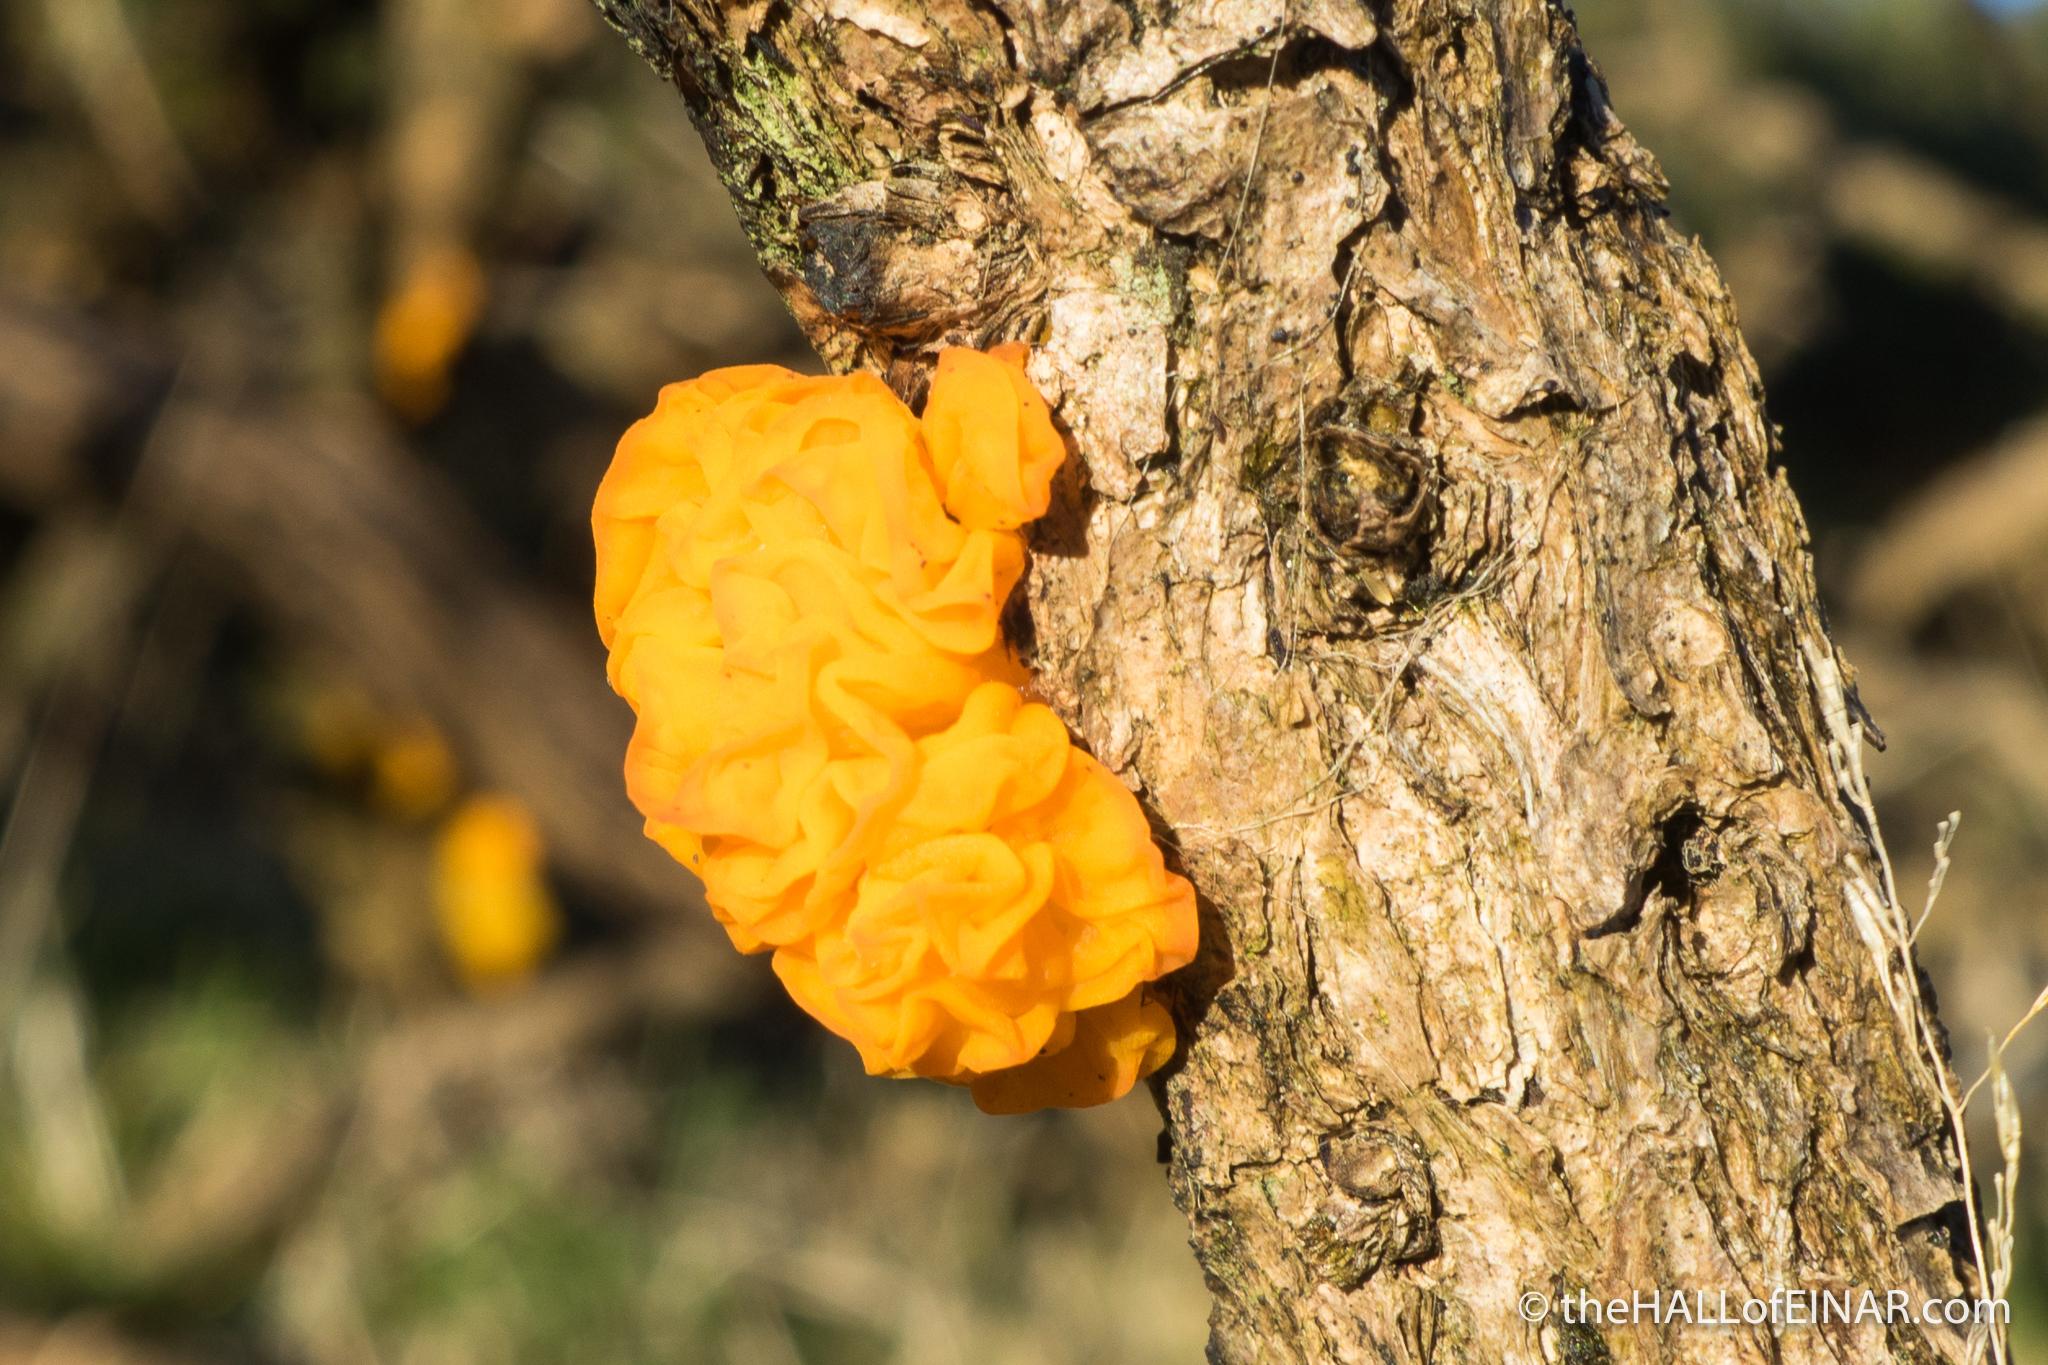 Yellow Brain Fungus (Tremella mesenterica) - The Hall of Einar - photograph (c) David Bailey (not the)